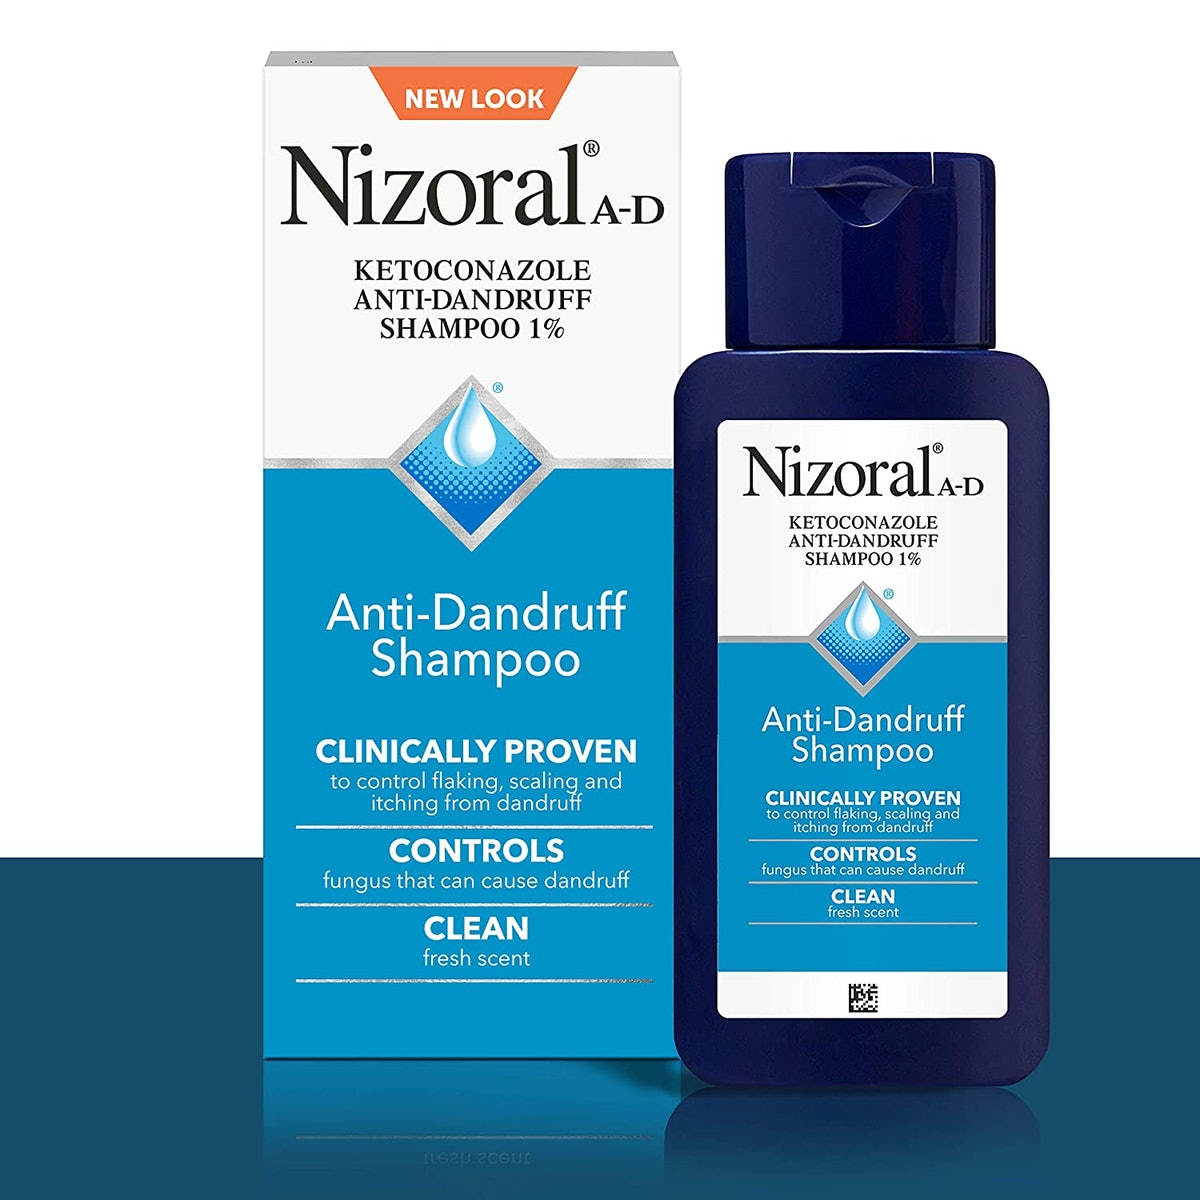 Nizoral Anti-Dandruff Shampoo, 7 Oz.